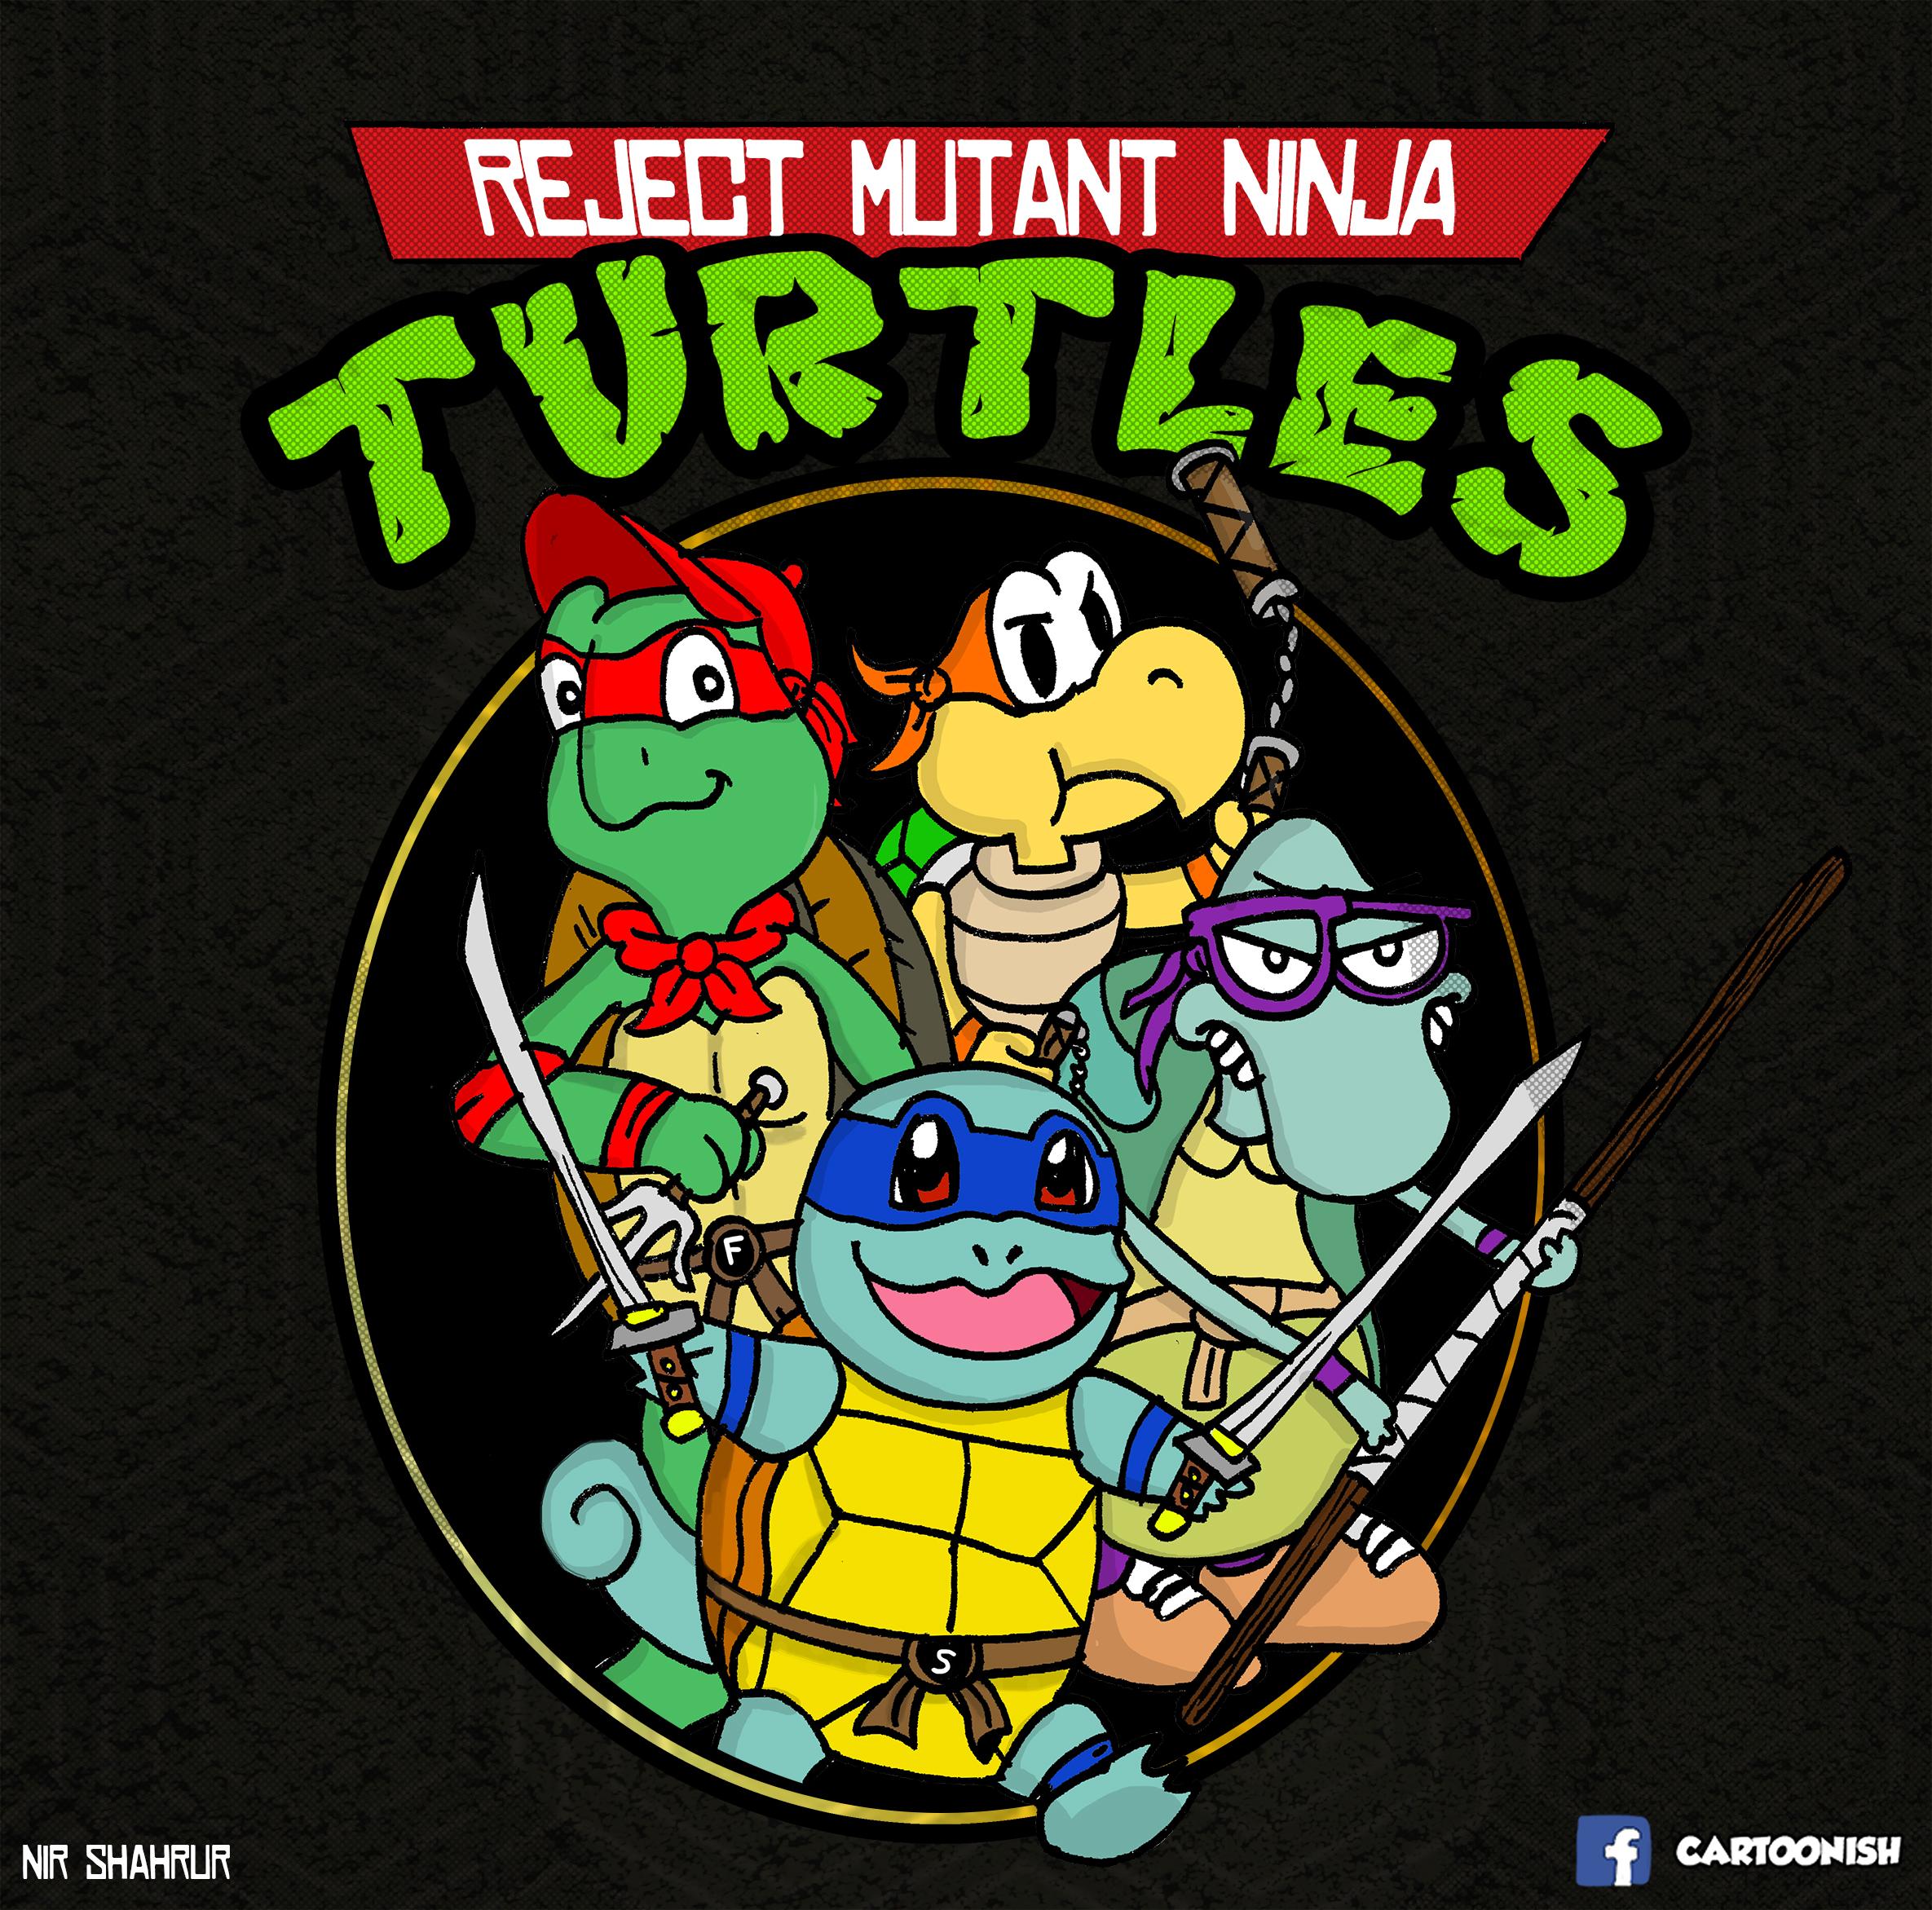 Reject Mutant Ninja Turtles